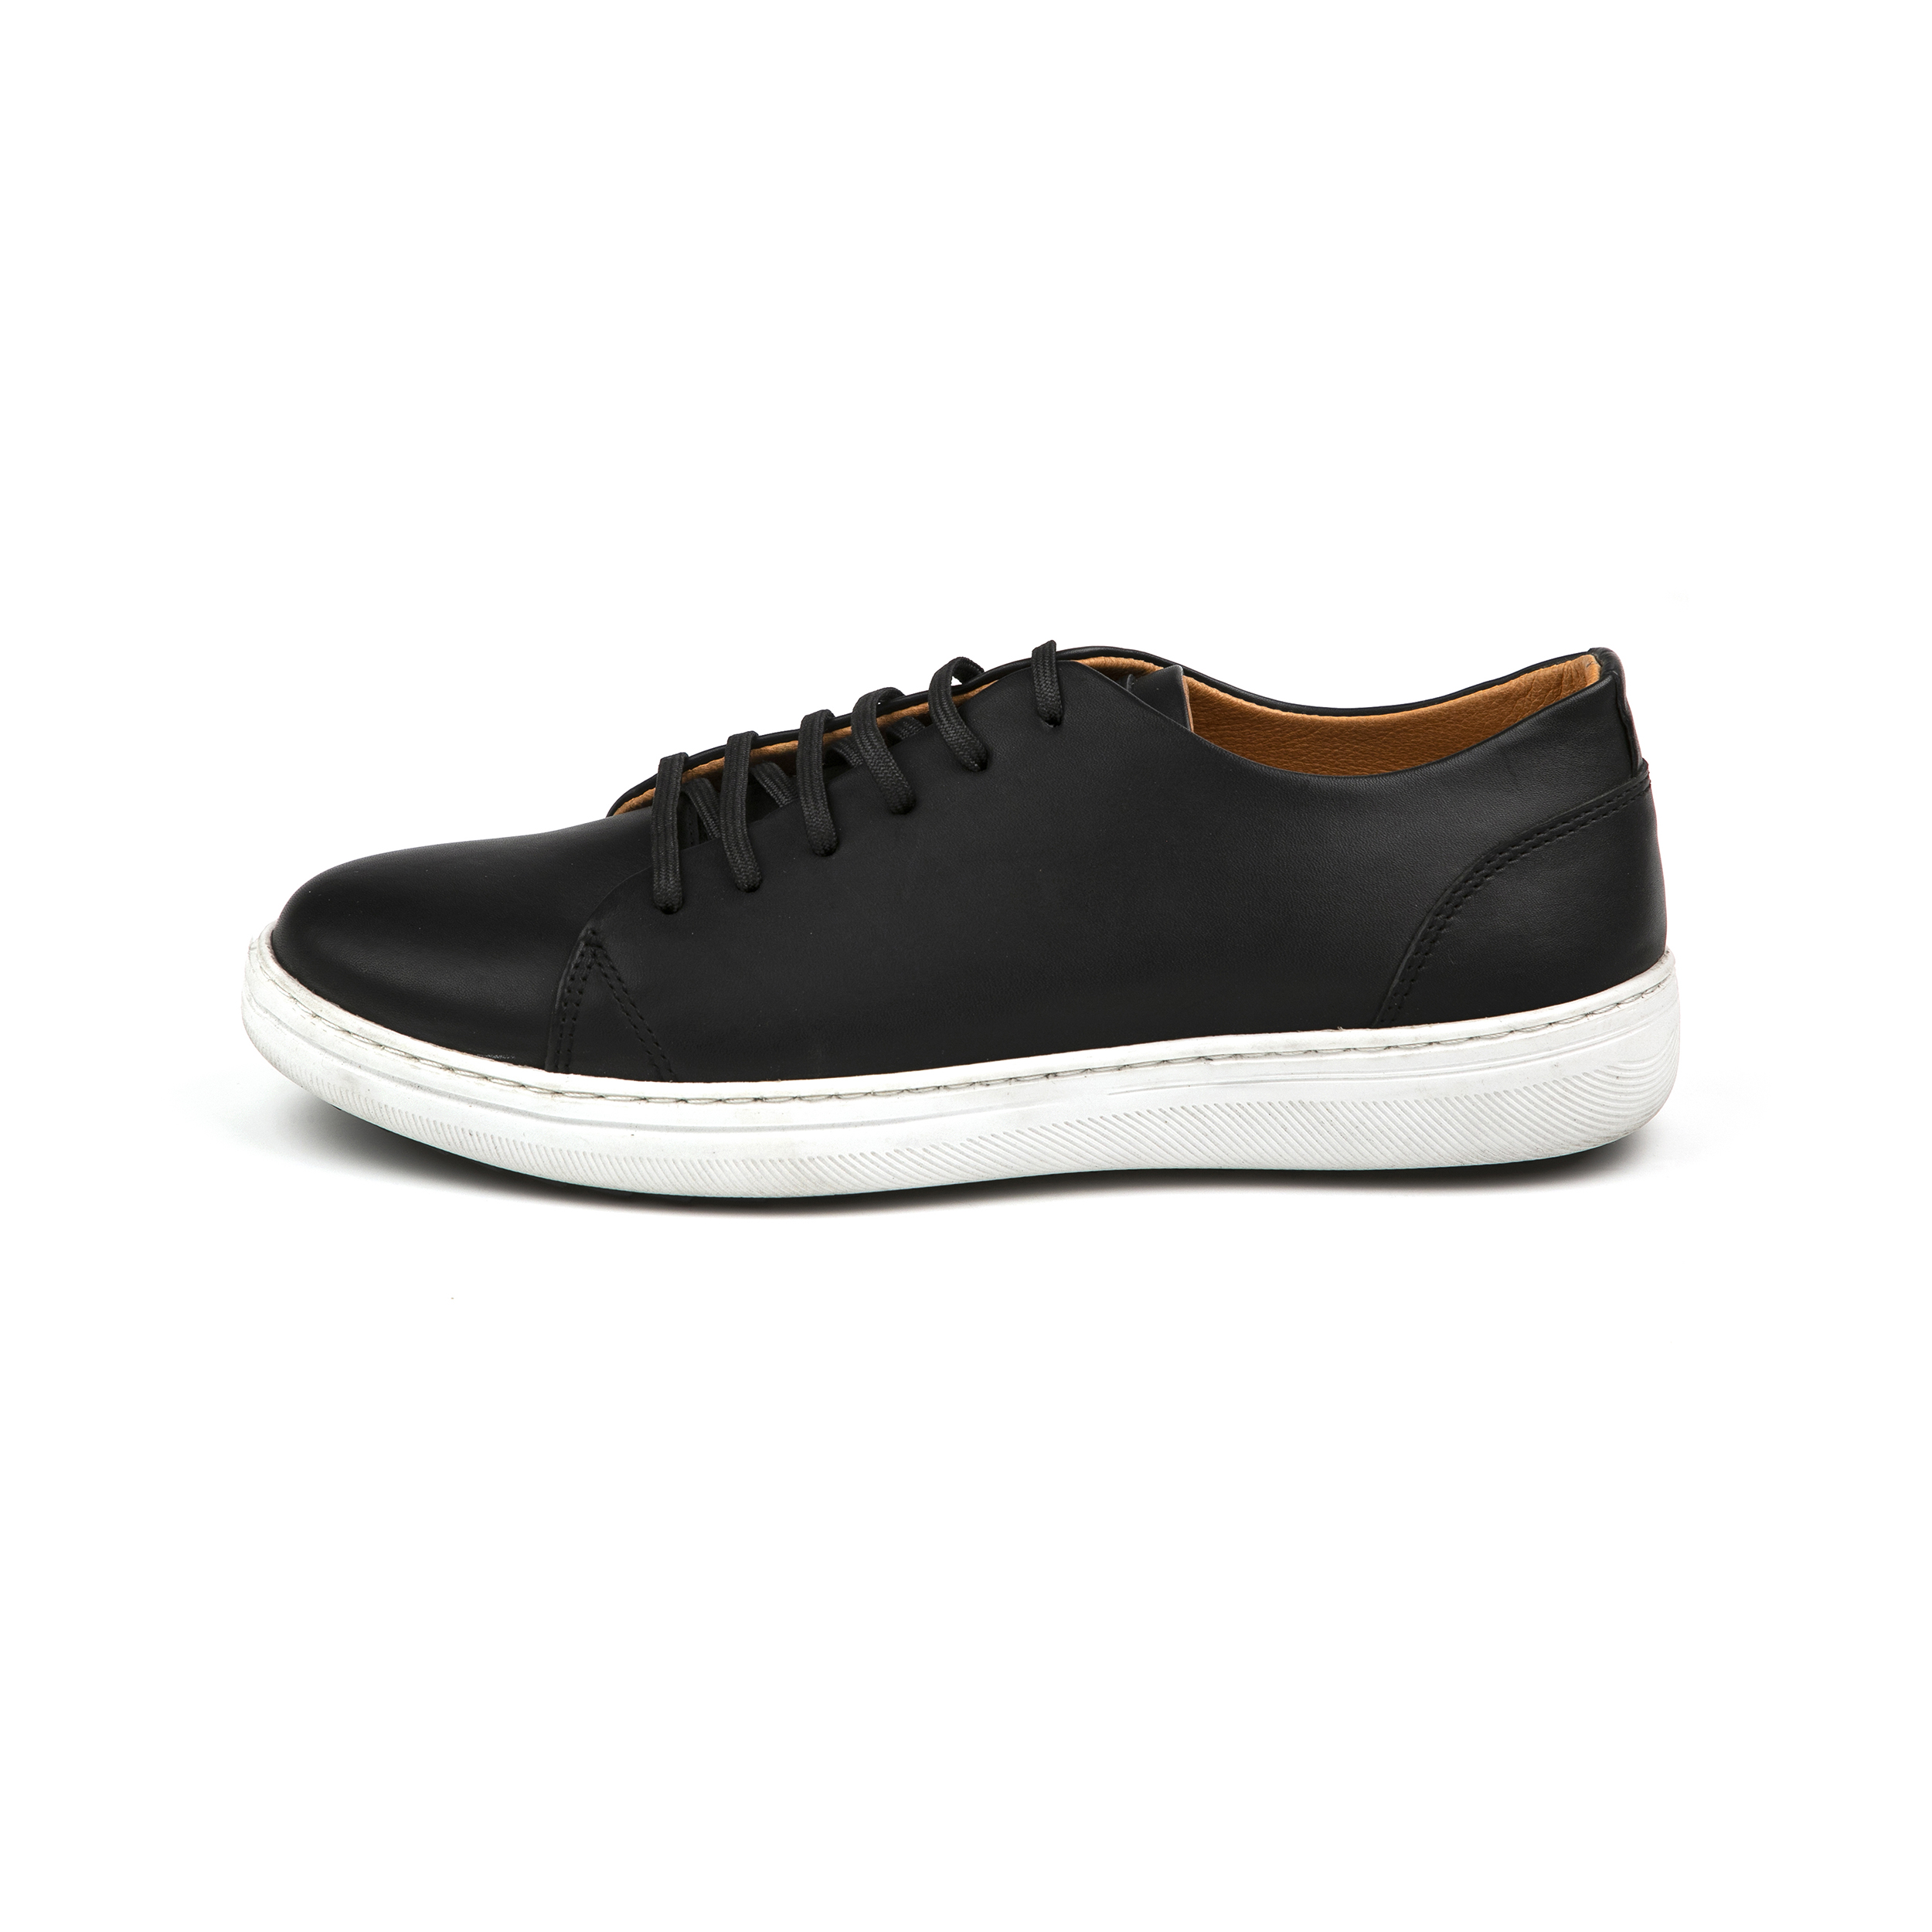 کفش روزمره مردانه سولا  مدل SM728600018Black